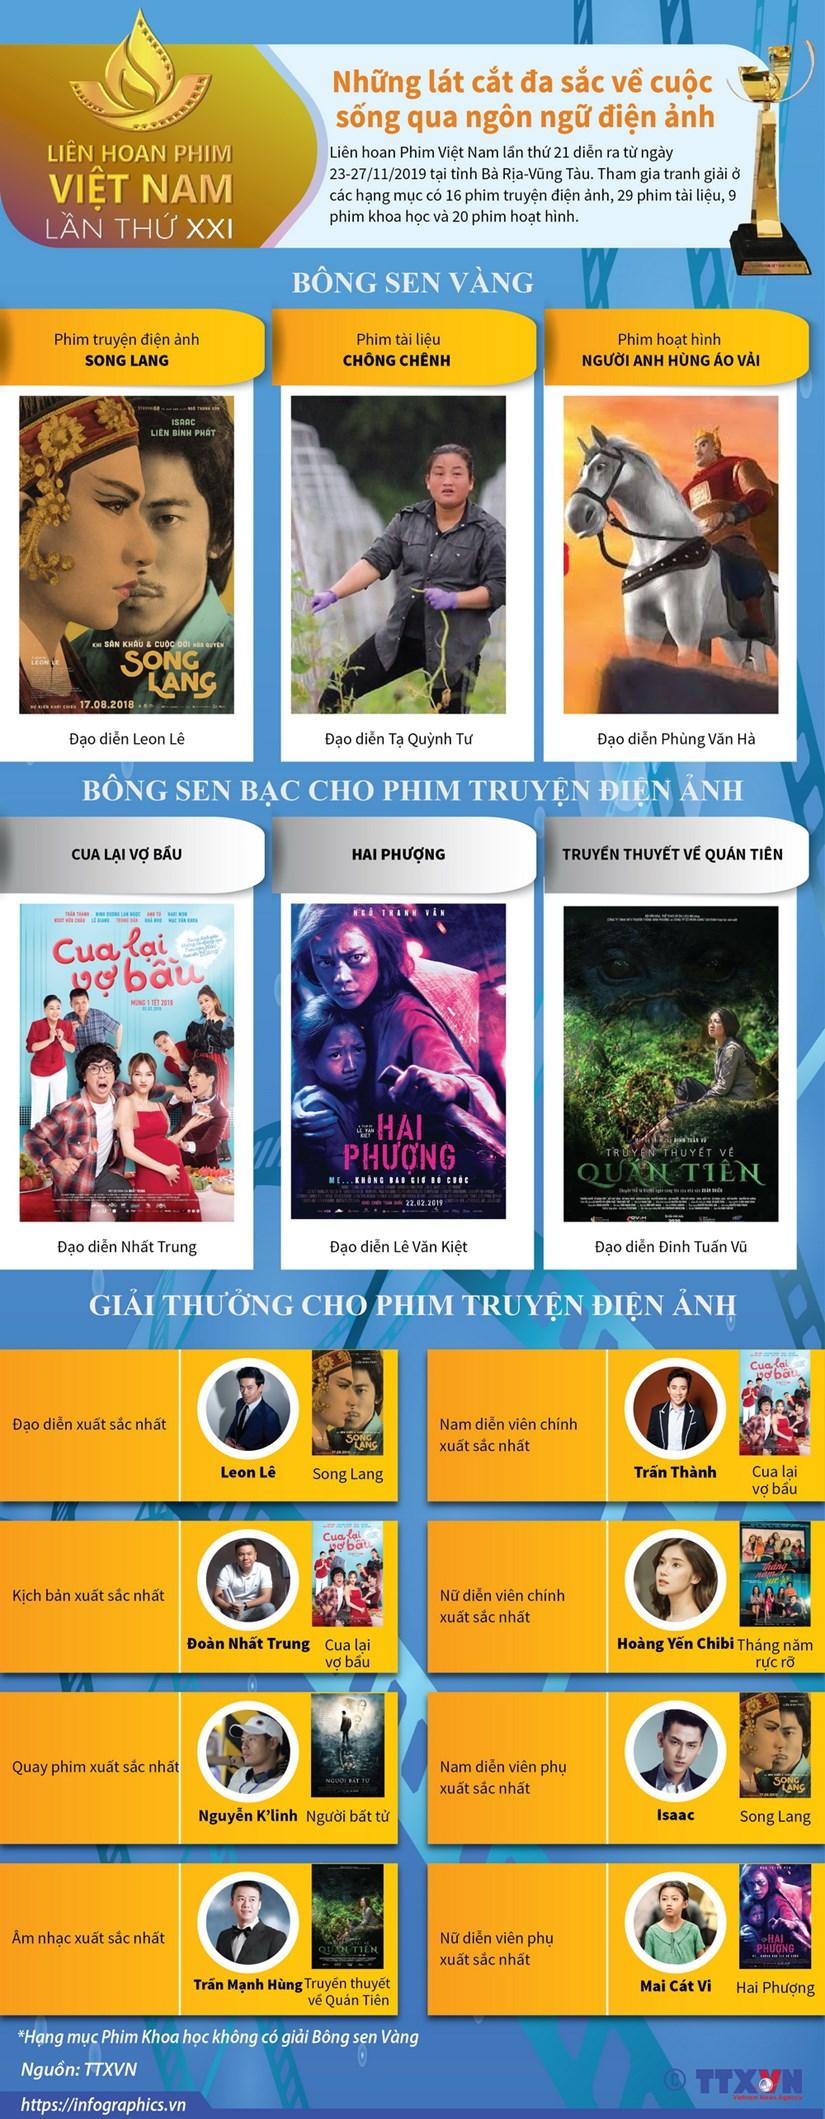 [Infographics] Cac giai thuong cua Lien hoan phim Viet Nam lan thu XXI hinh anh 1